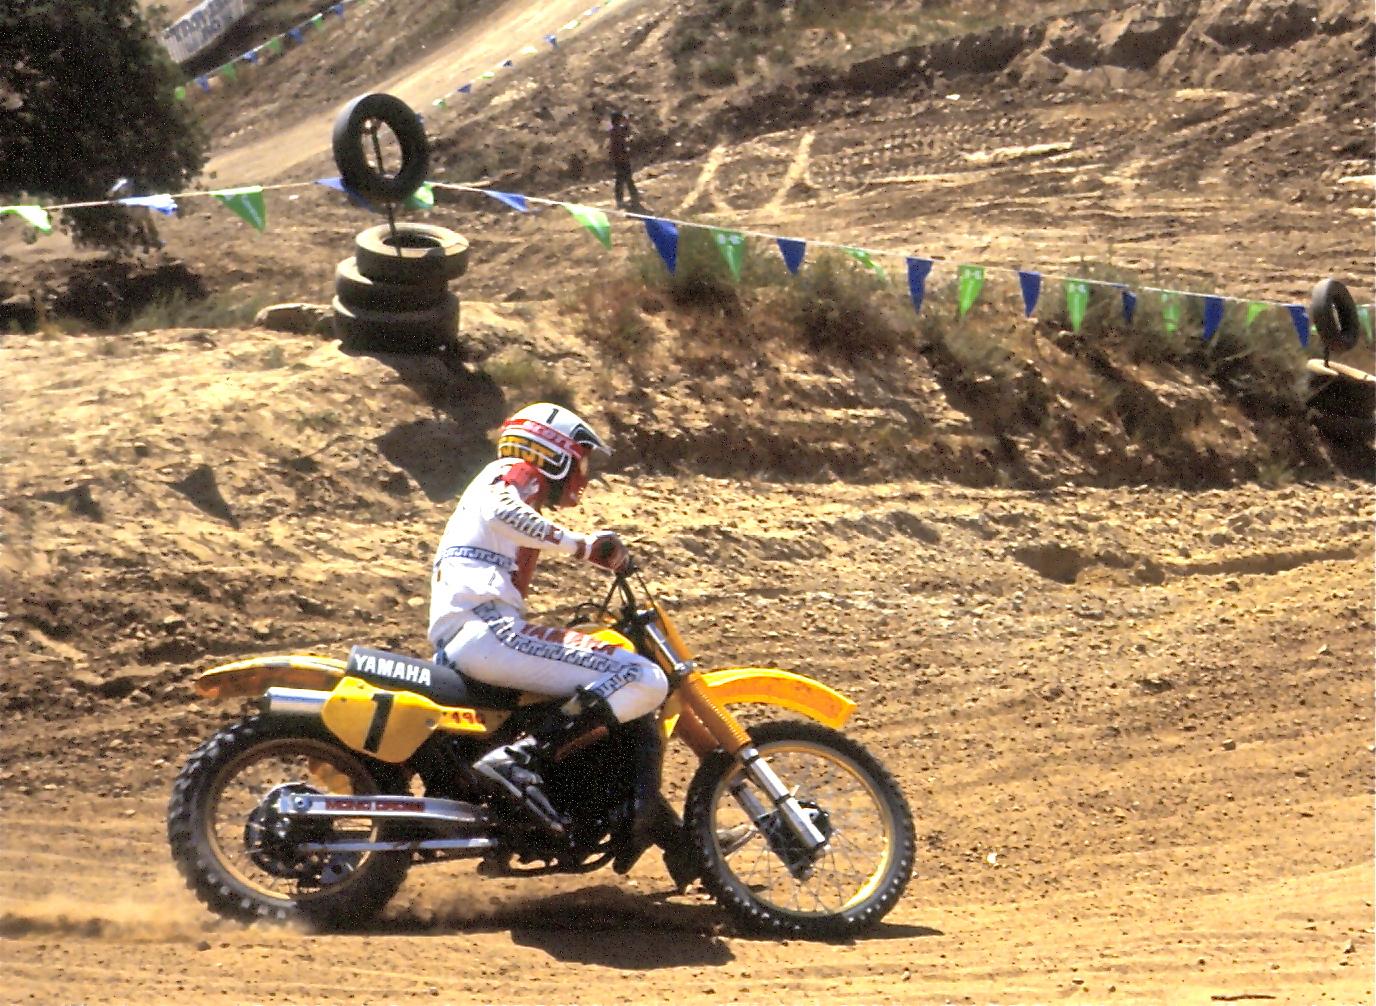 Broc Glover 1984 Saddleback Park 500cc National Xradrd